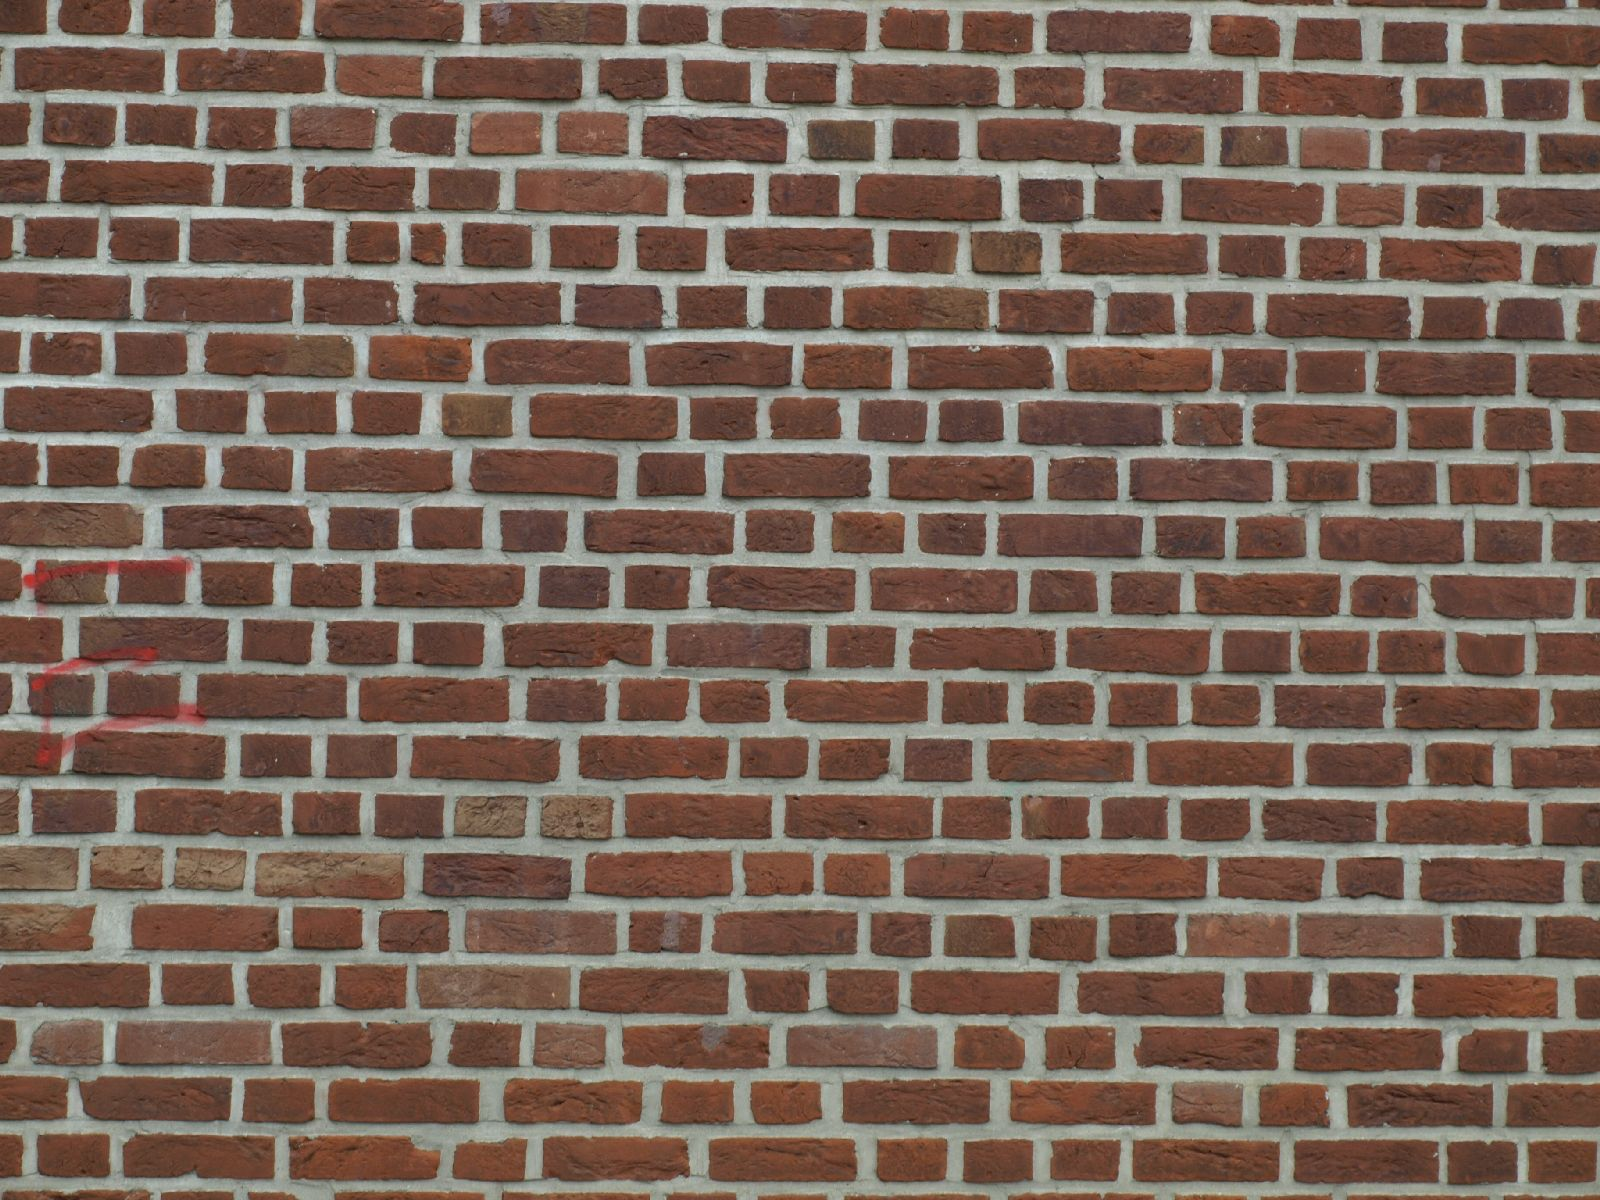 Wand-Mauerwerk-Backstein_Textur_A_P4041480